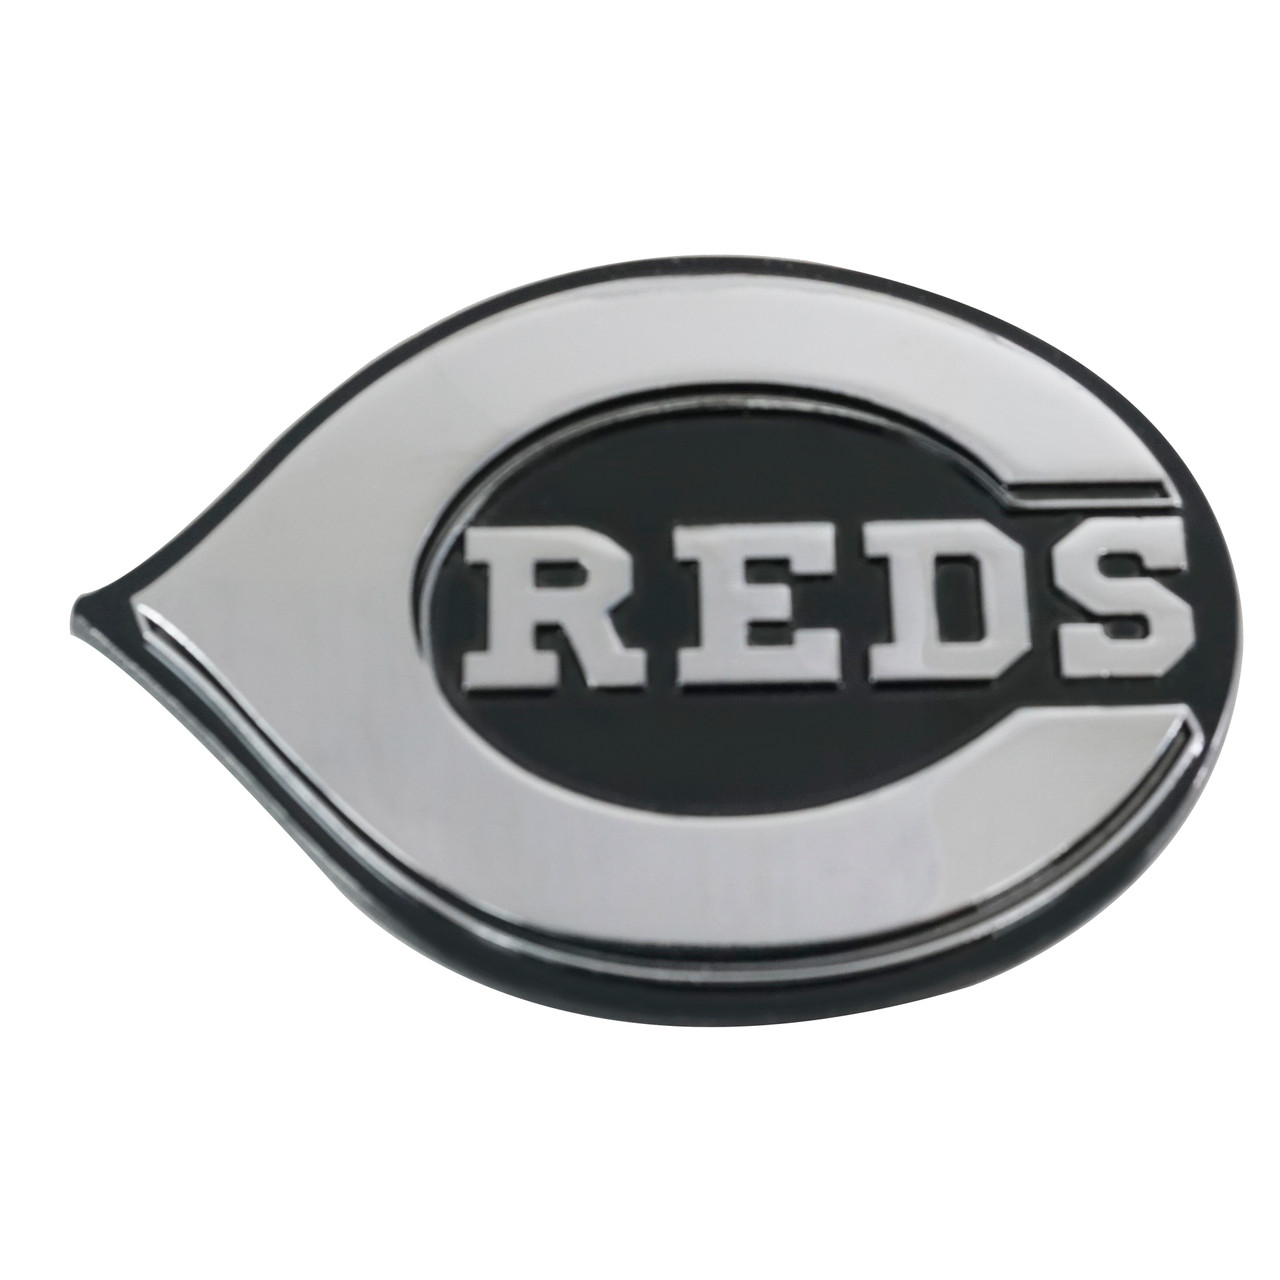 Cincinnati Reds Auto Emblem Premium Metal Chrome Special Order